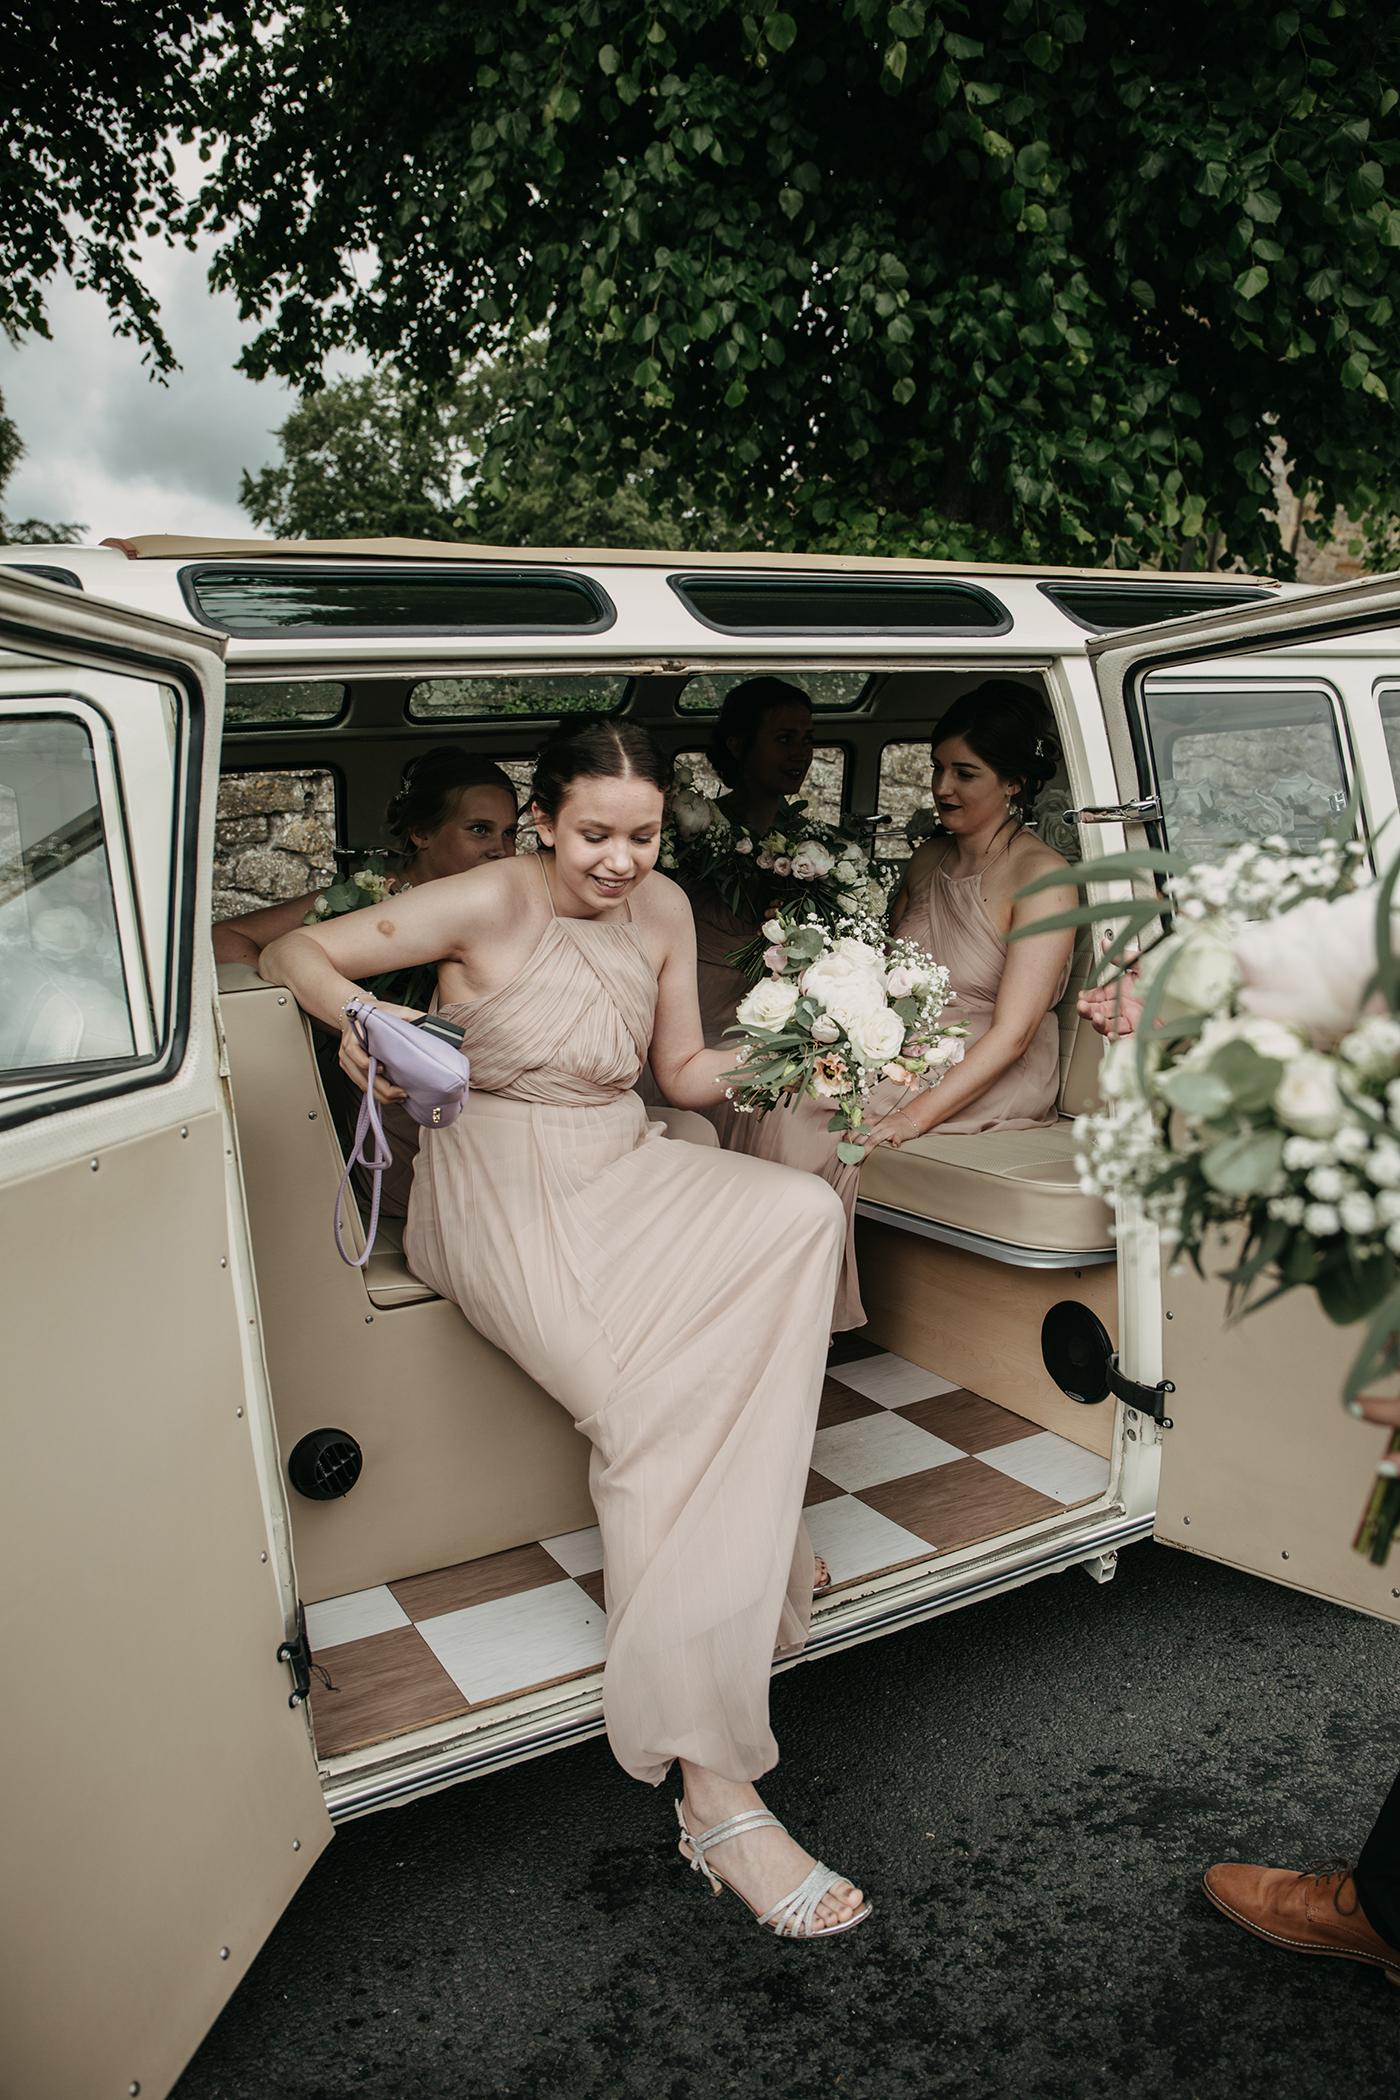 lancaster wedding photographer sarah longworth